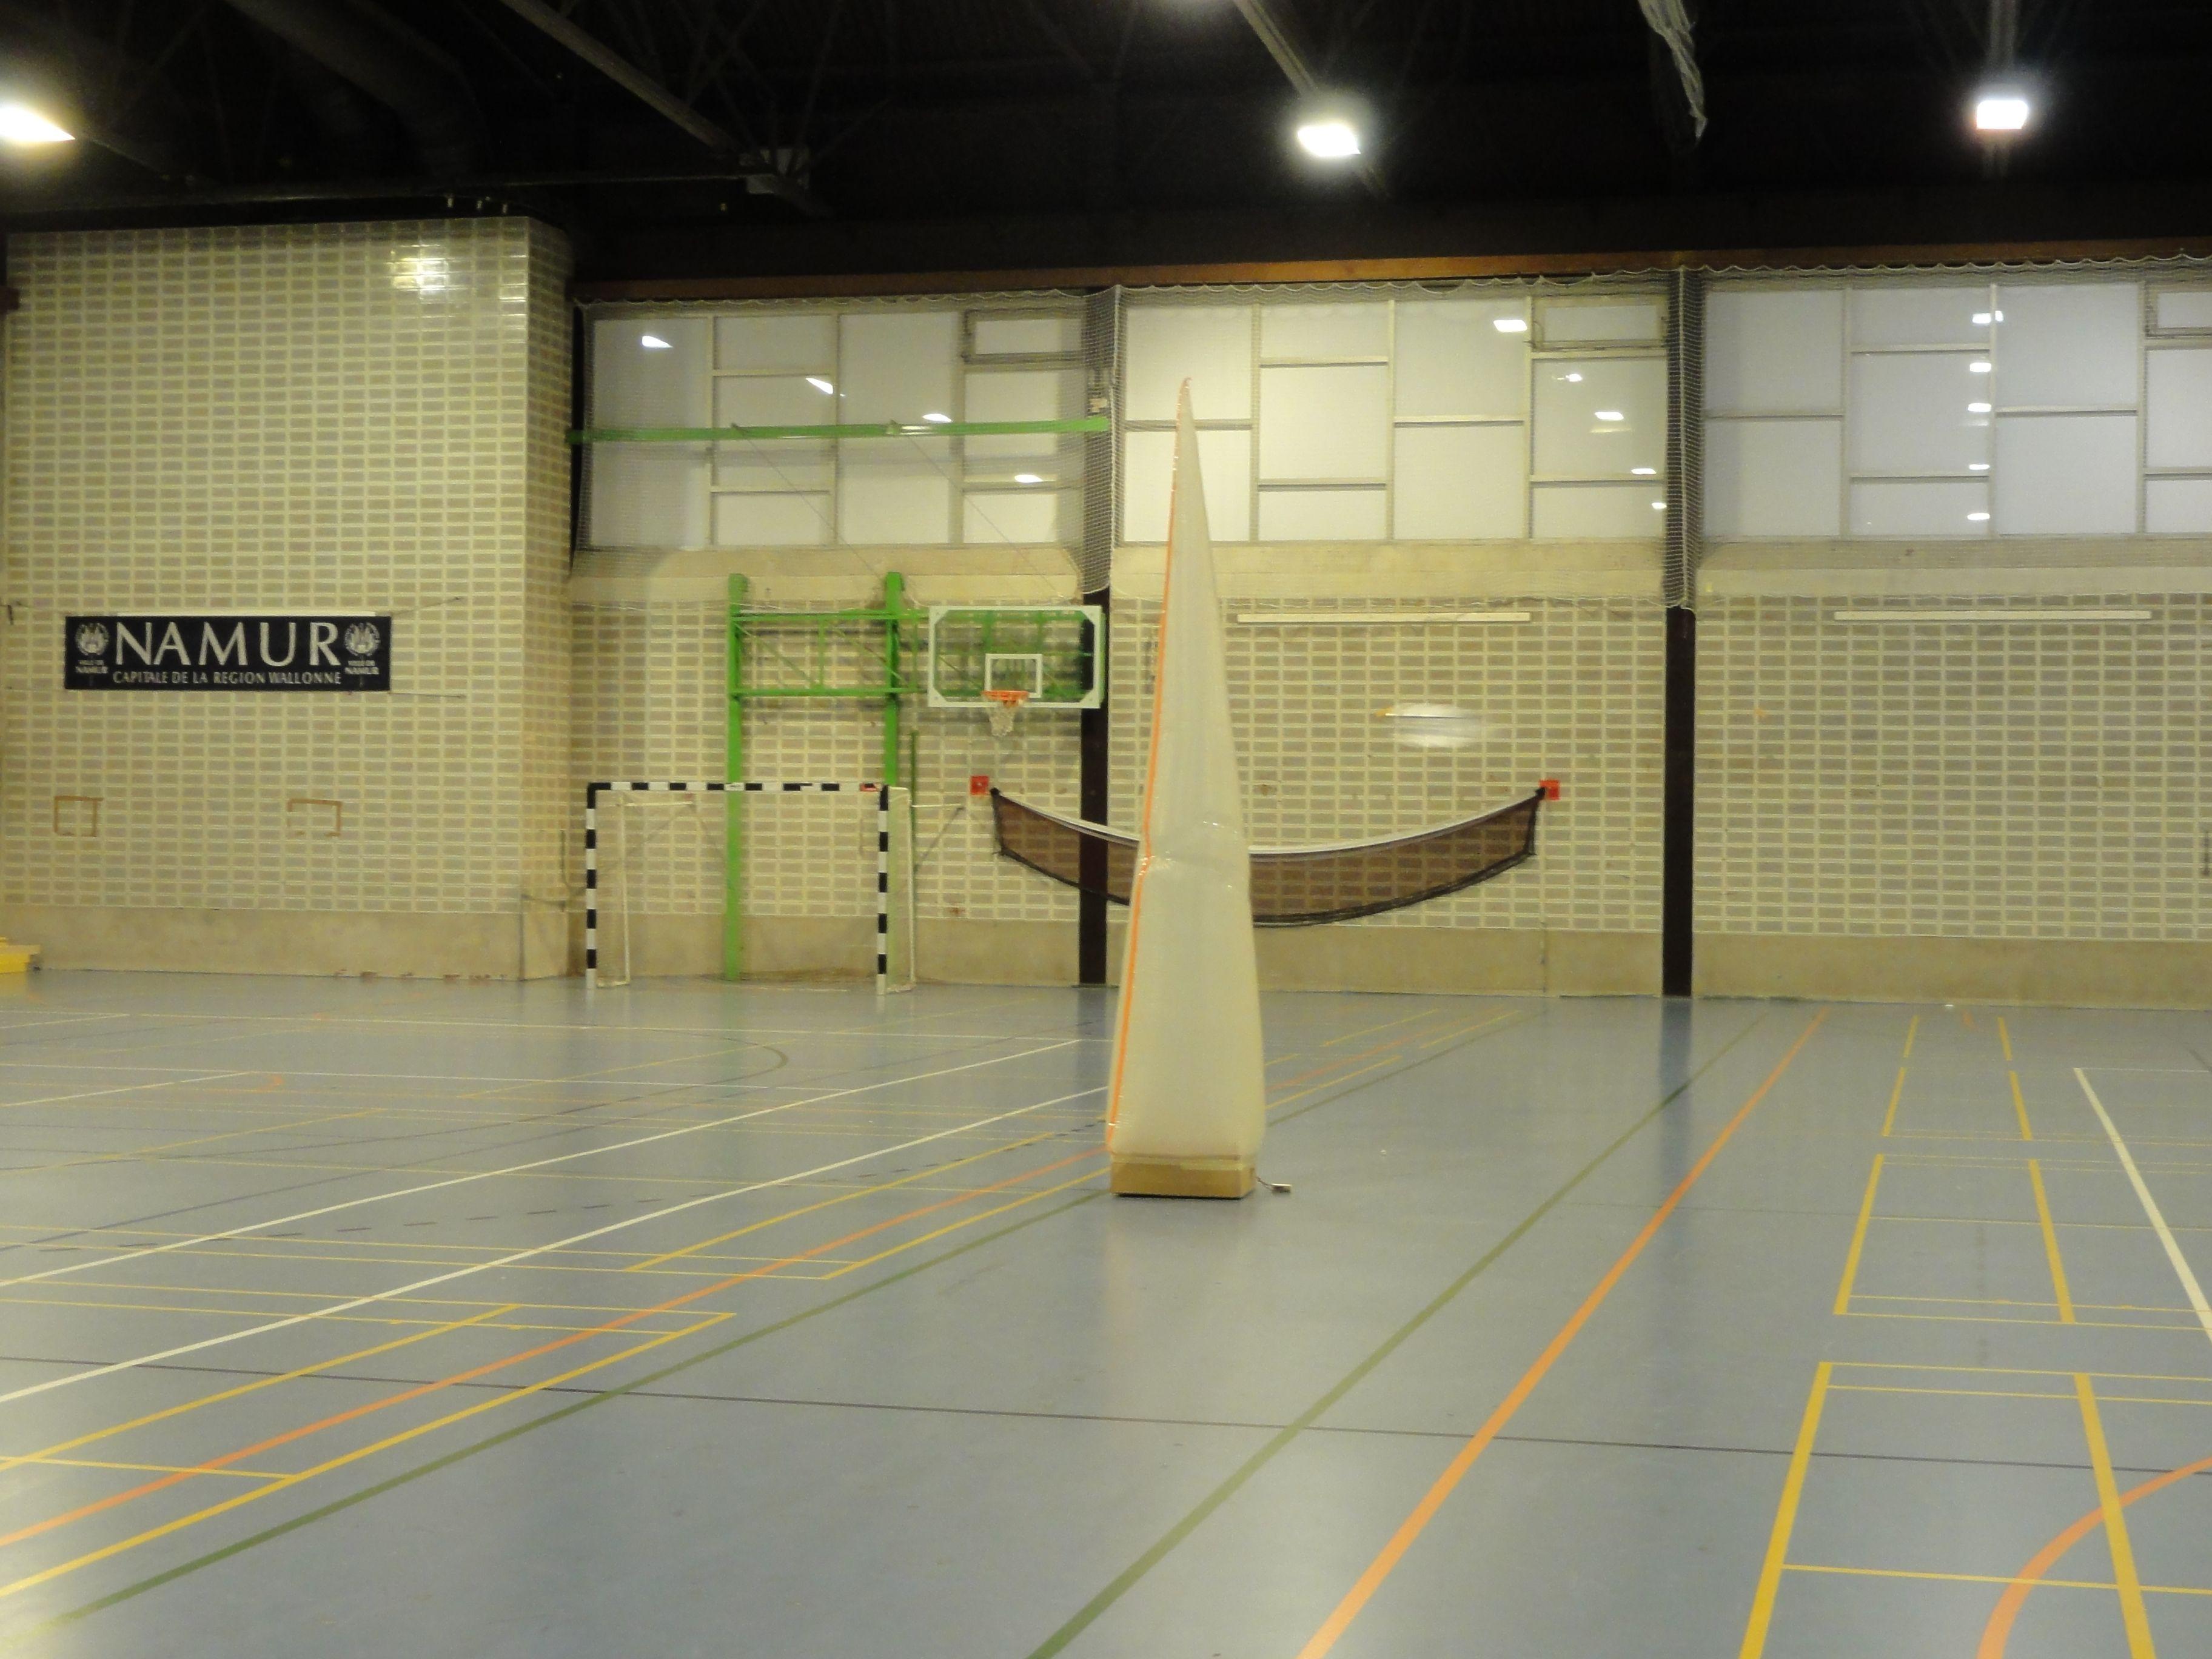 ace hardwood flooring smithfield ri of galerie photo du model club de la meuse tabora 29 dacembre 2012 in dsc00022